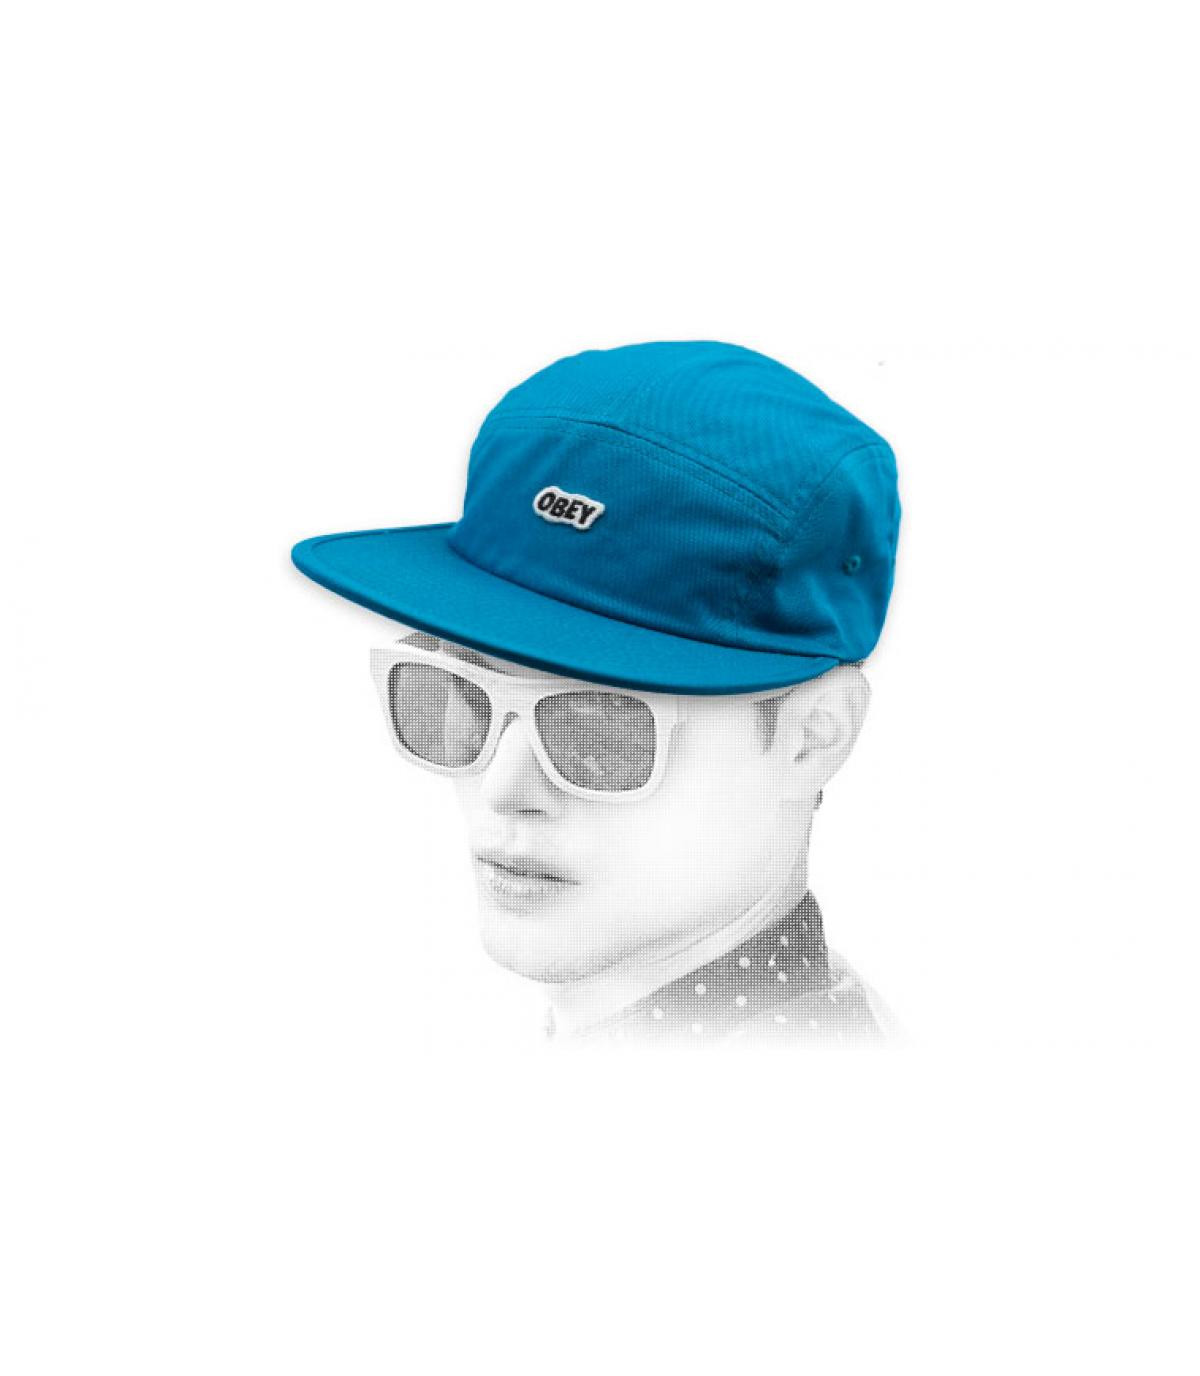 gorra Obey 5 panel azul